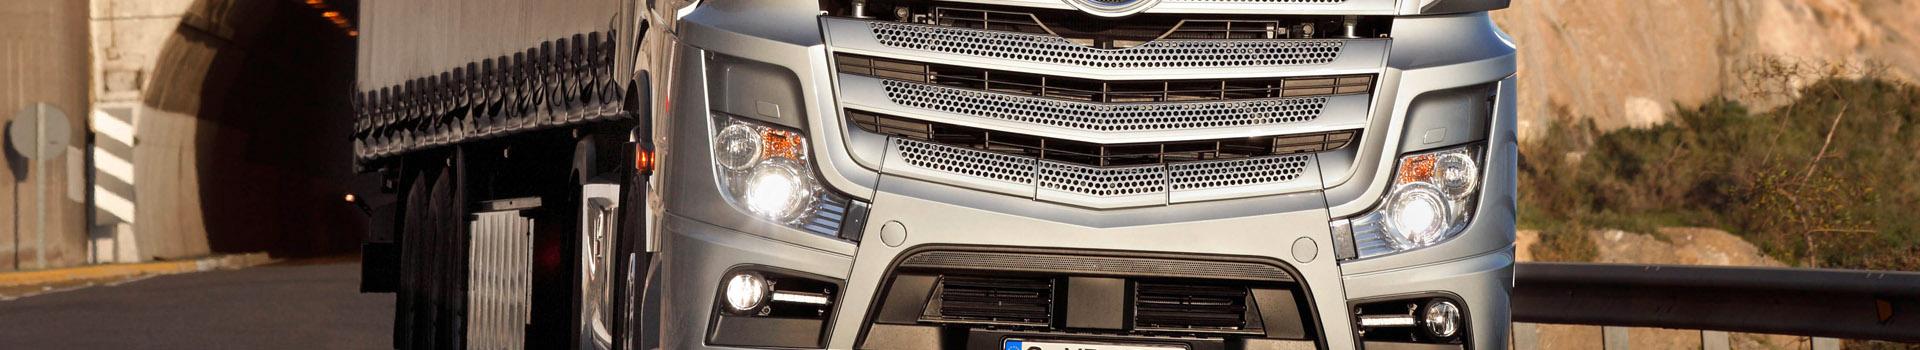 mercedes-benz-coated-headlights